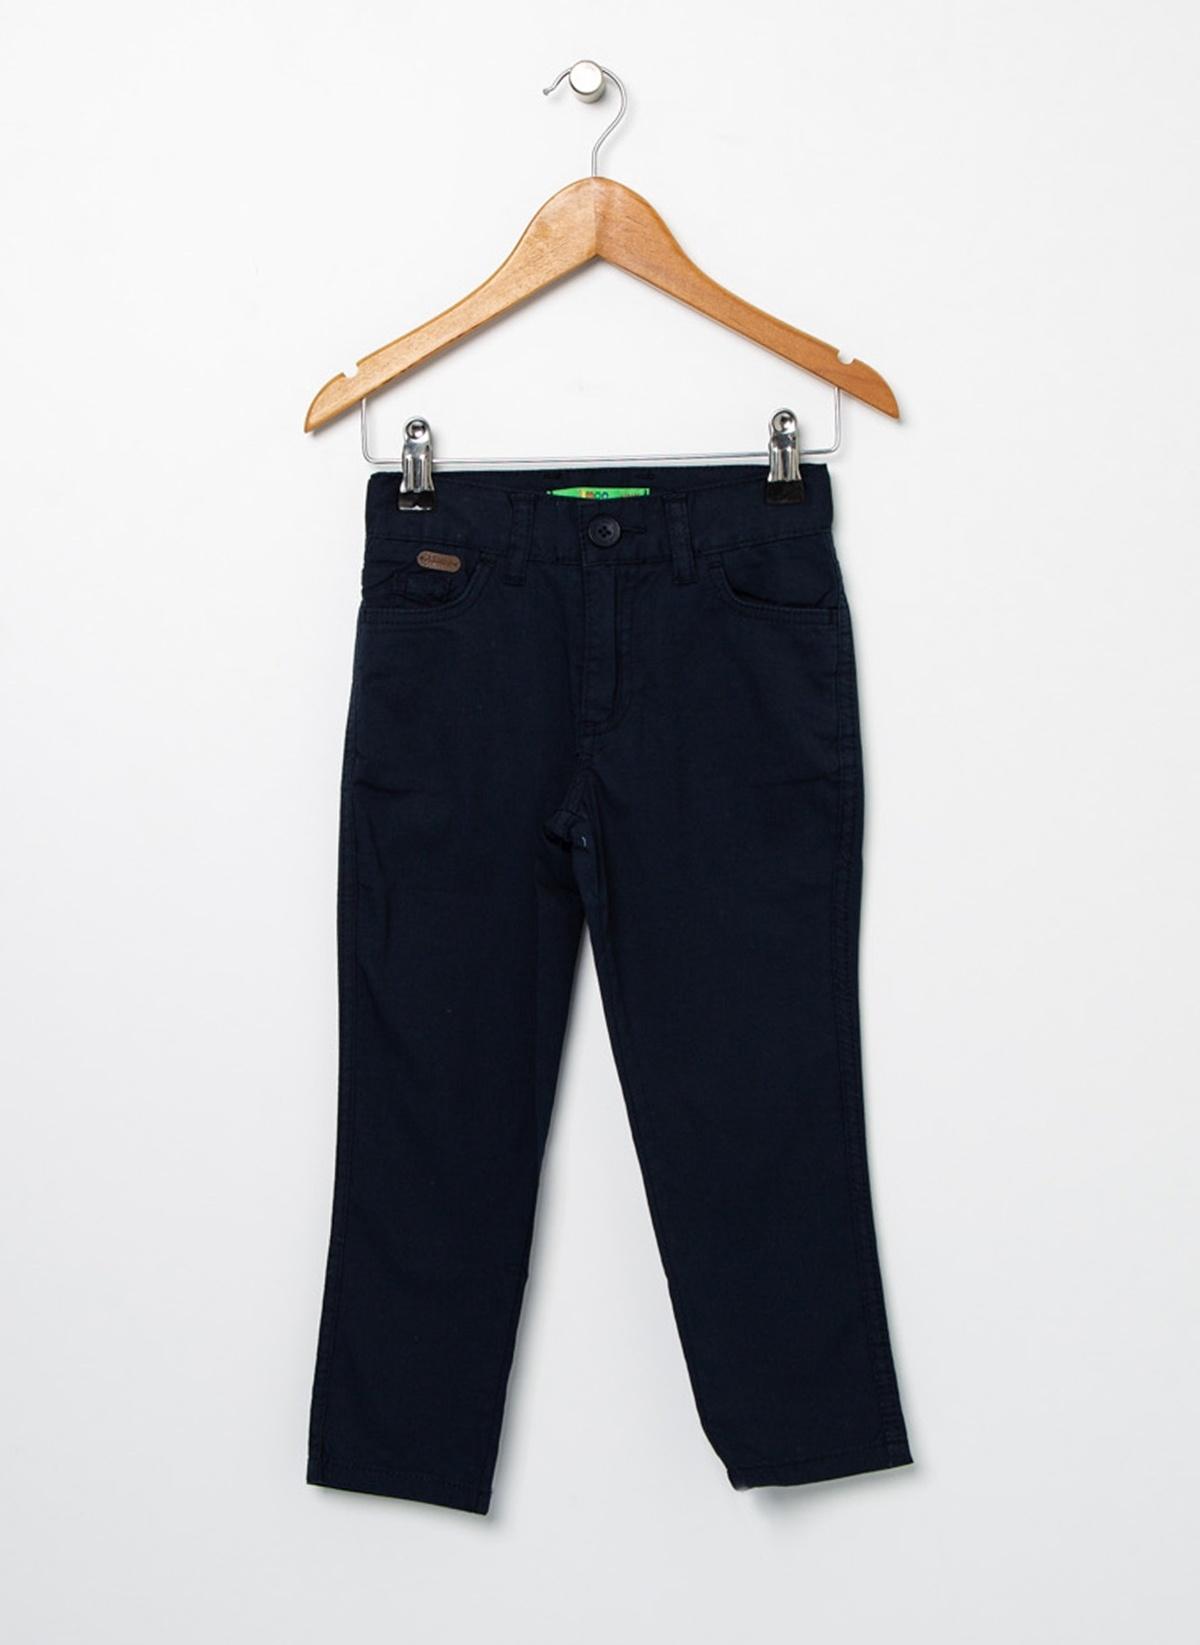 Erkek Çocuk Limon Company Pantolon